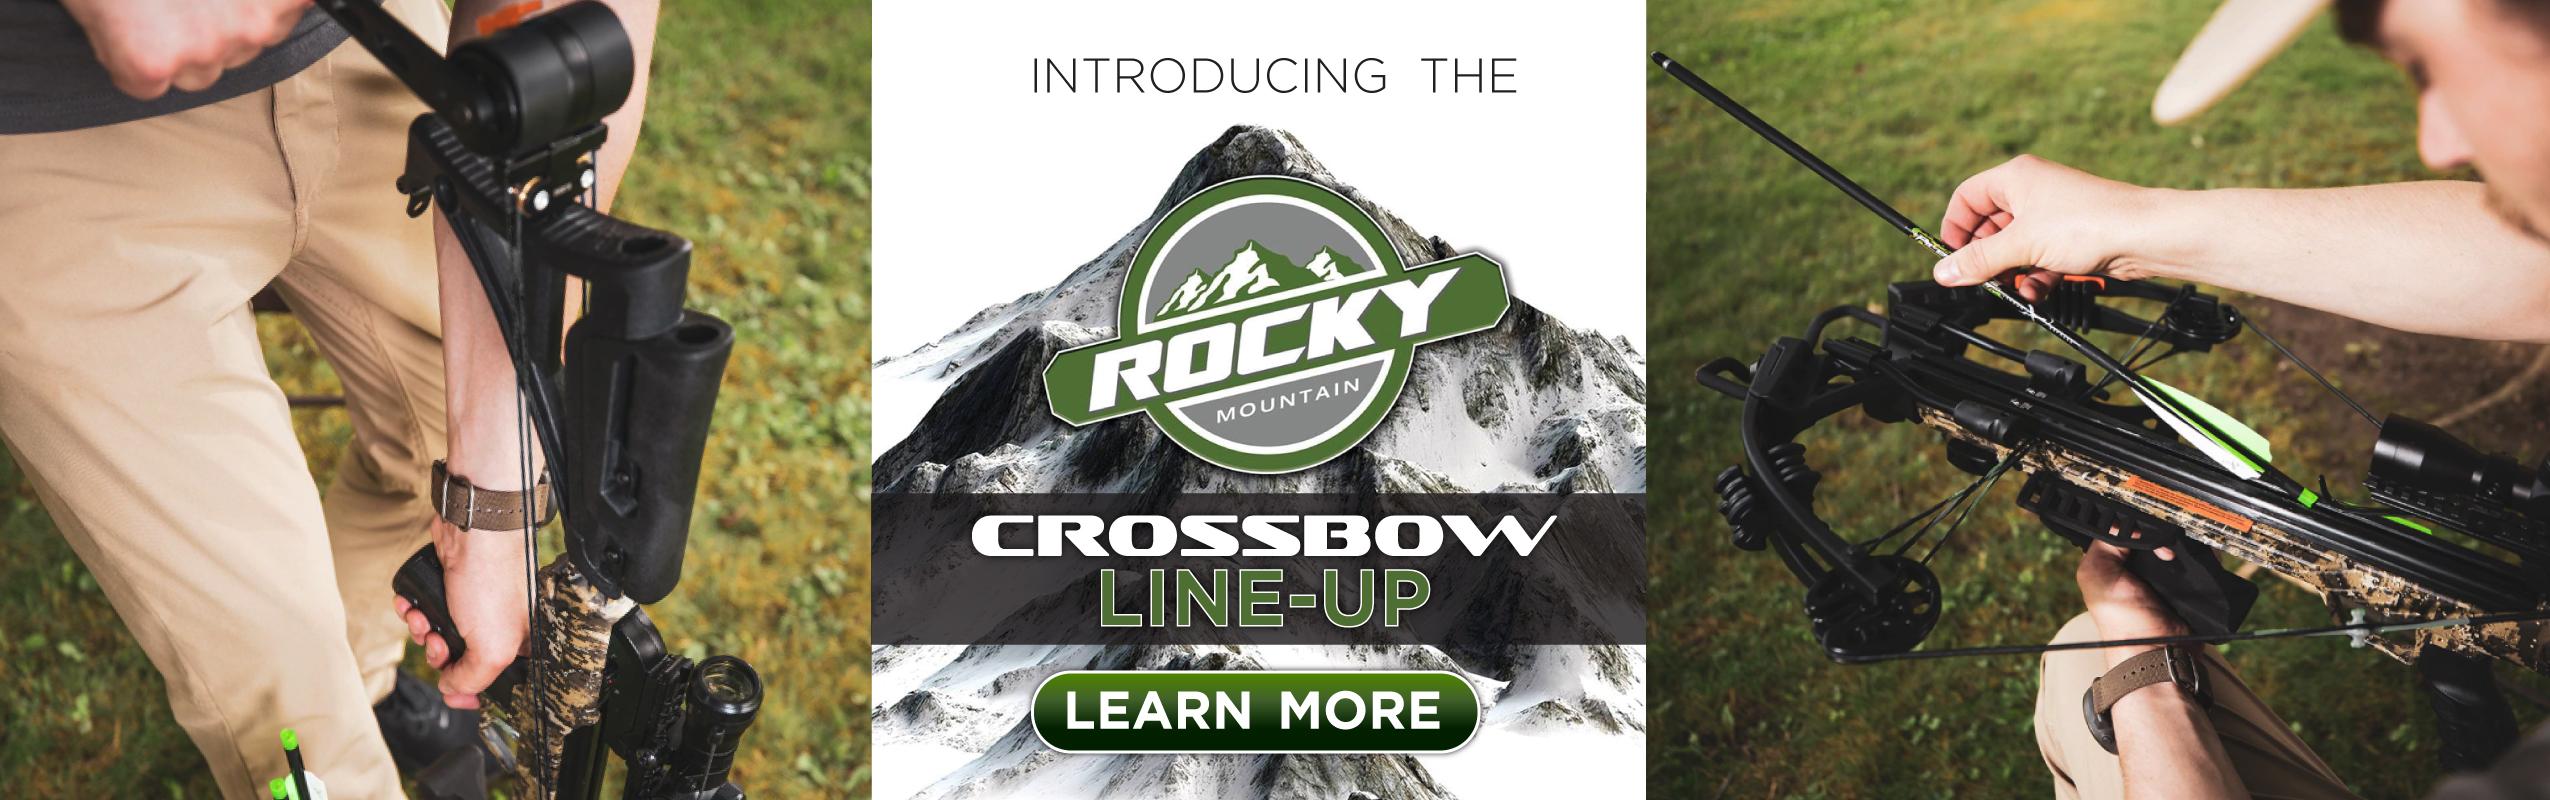 rocky-mountain-crossbow-line-up.jpg